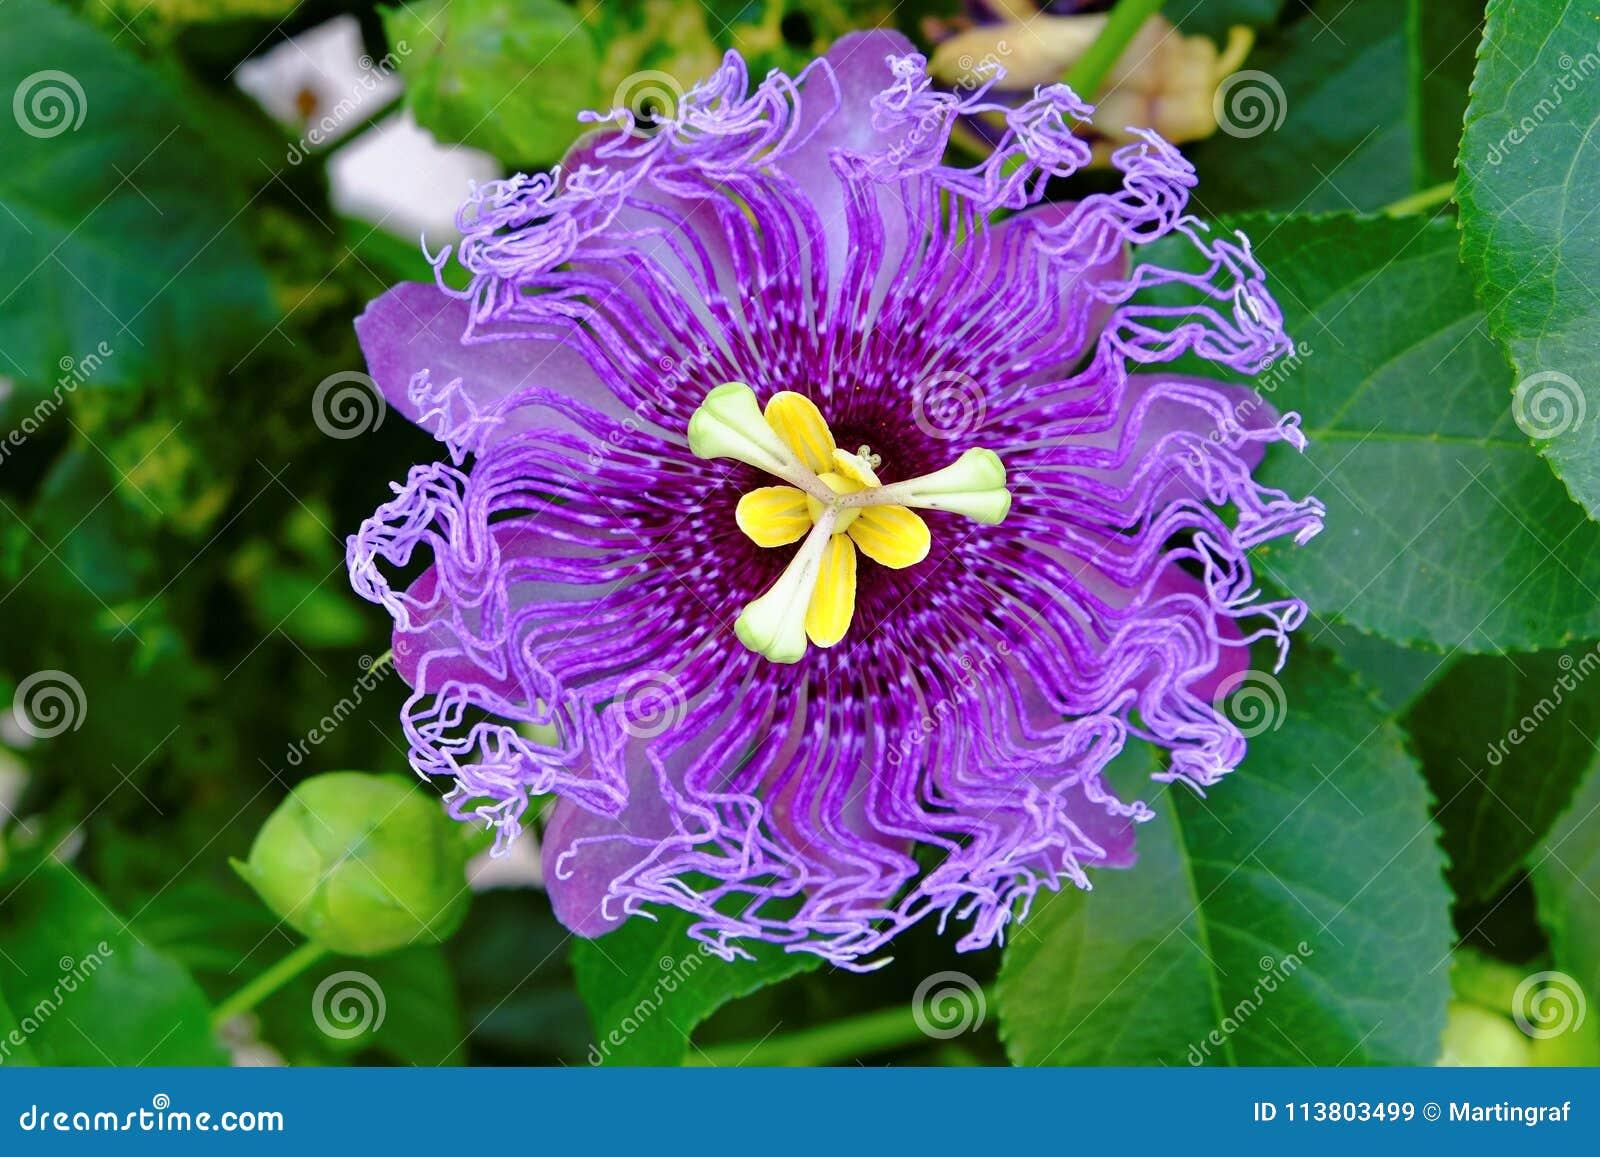 Passiebloem ultraviolette bloei in groene bladeren